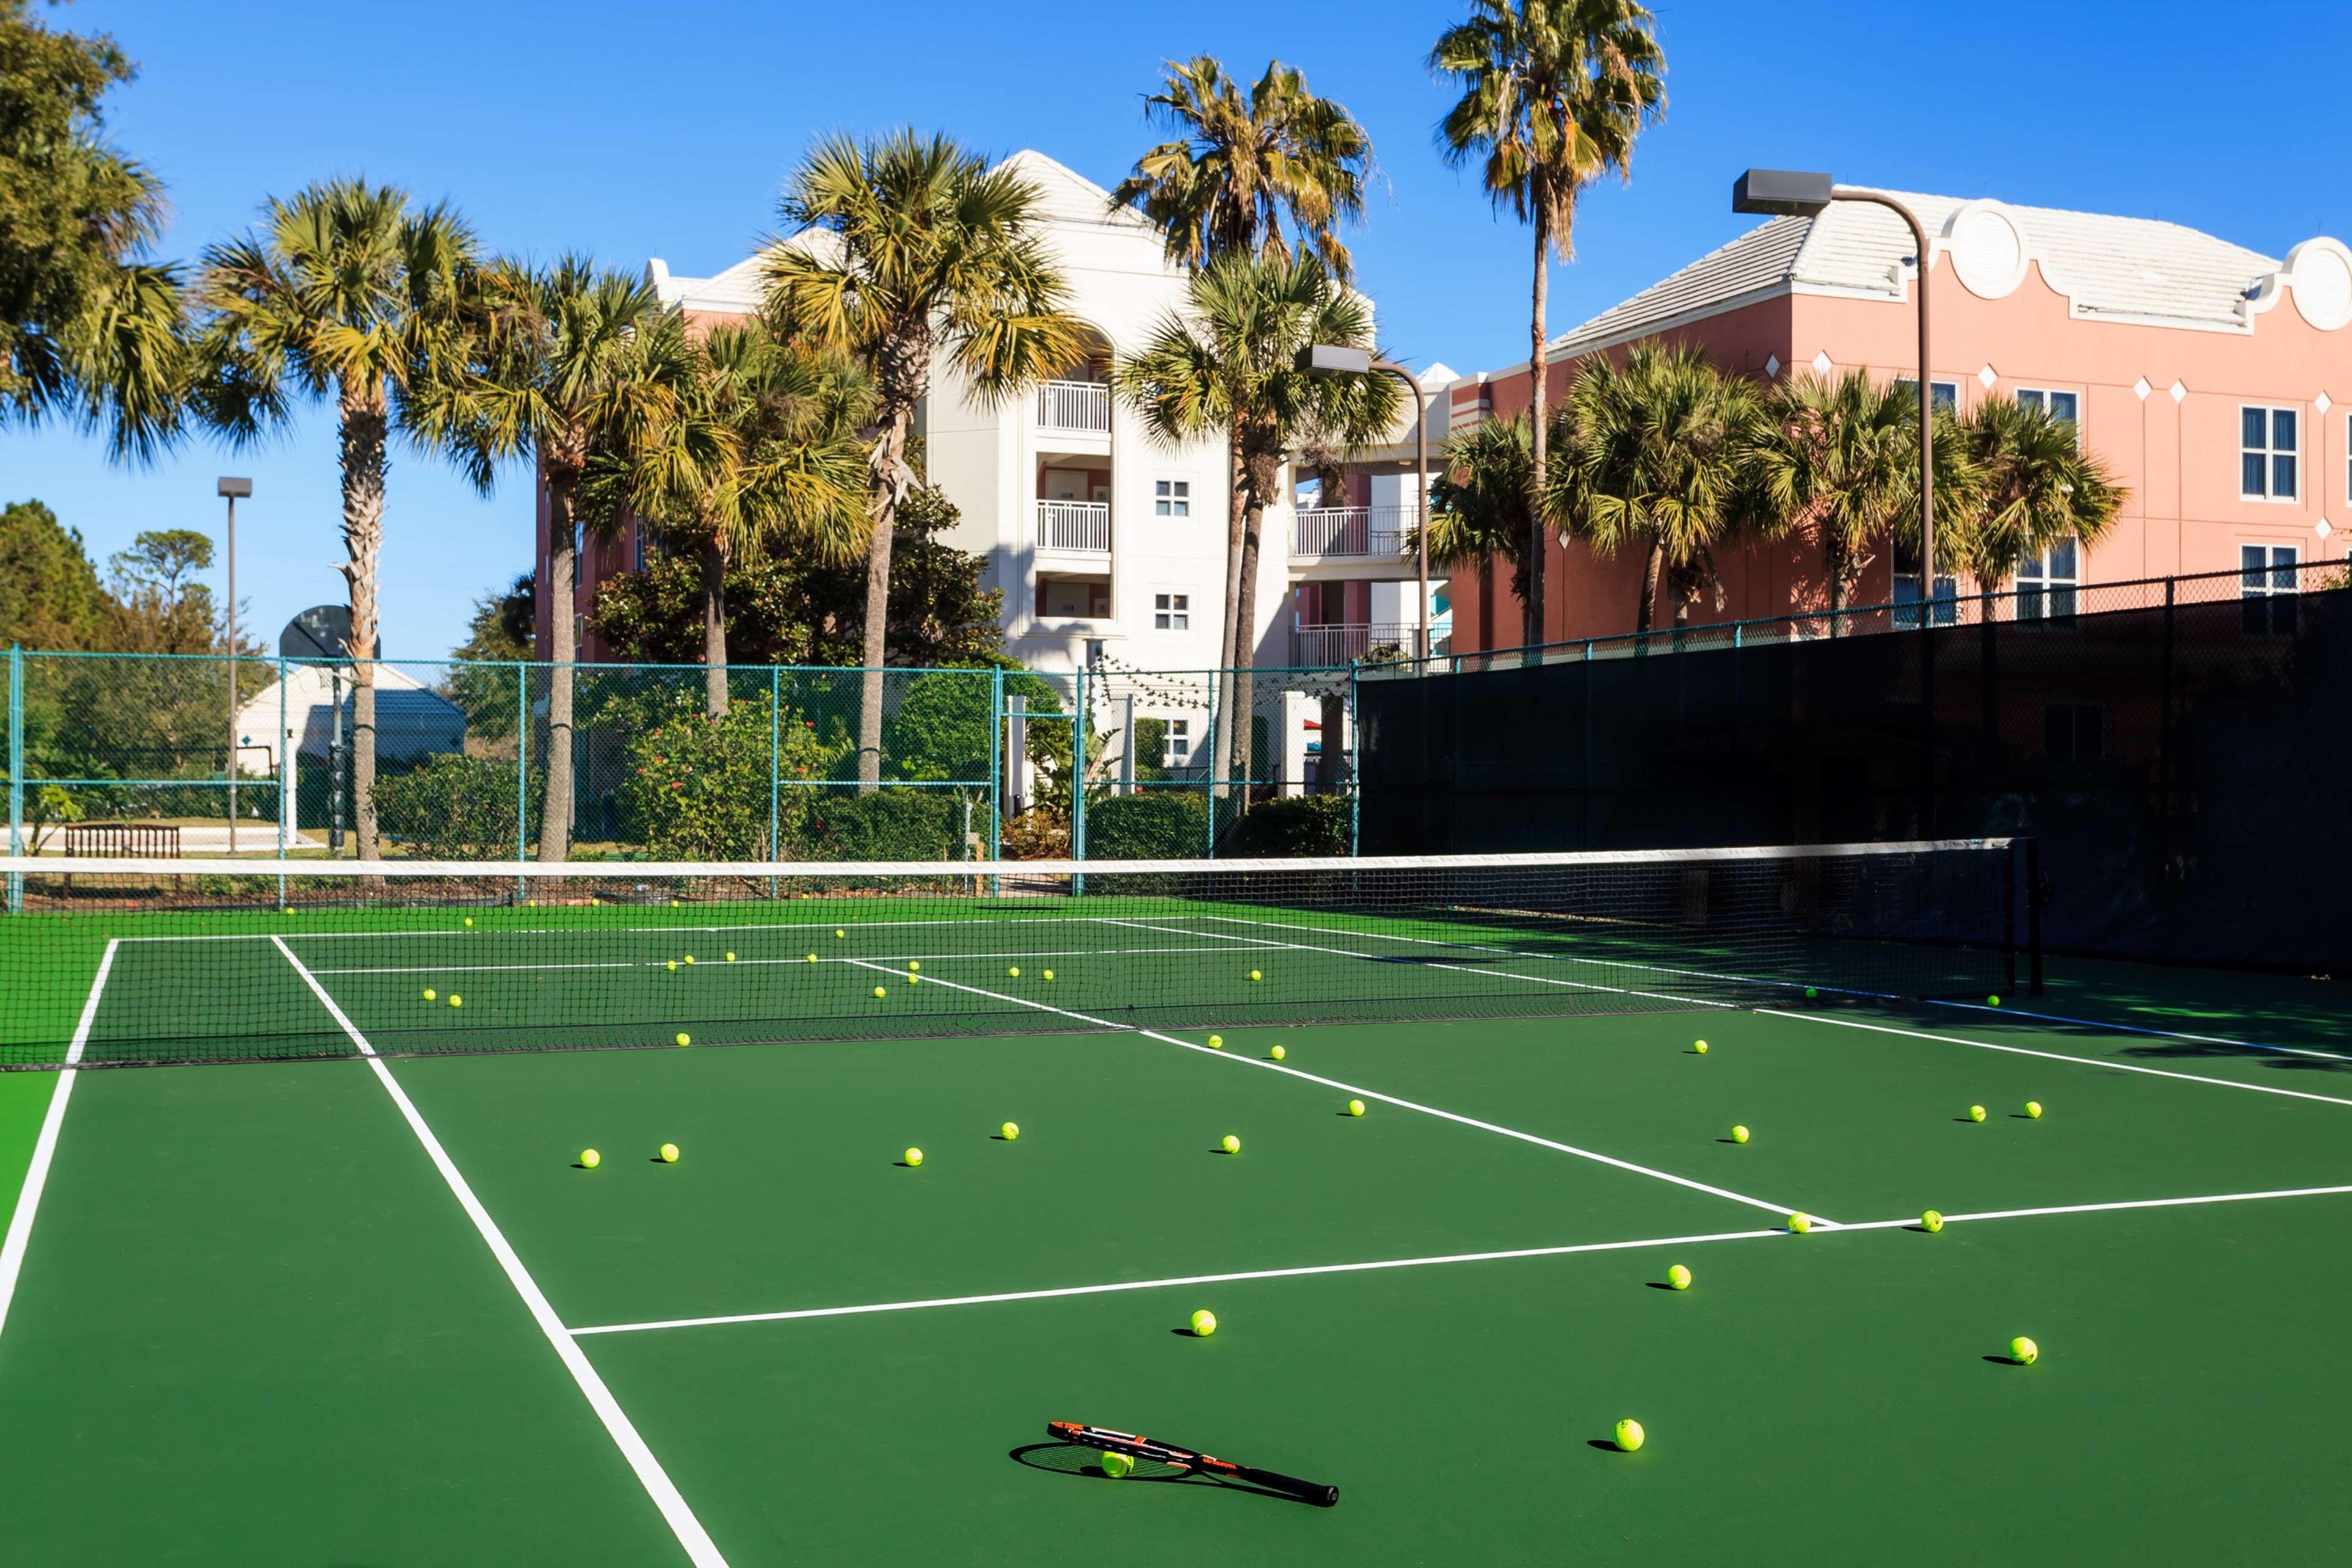 Embassy Suites by Hilton Orlando Lake Buena Vista Resort image 28